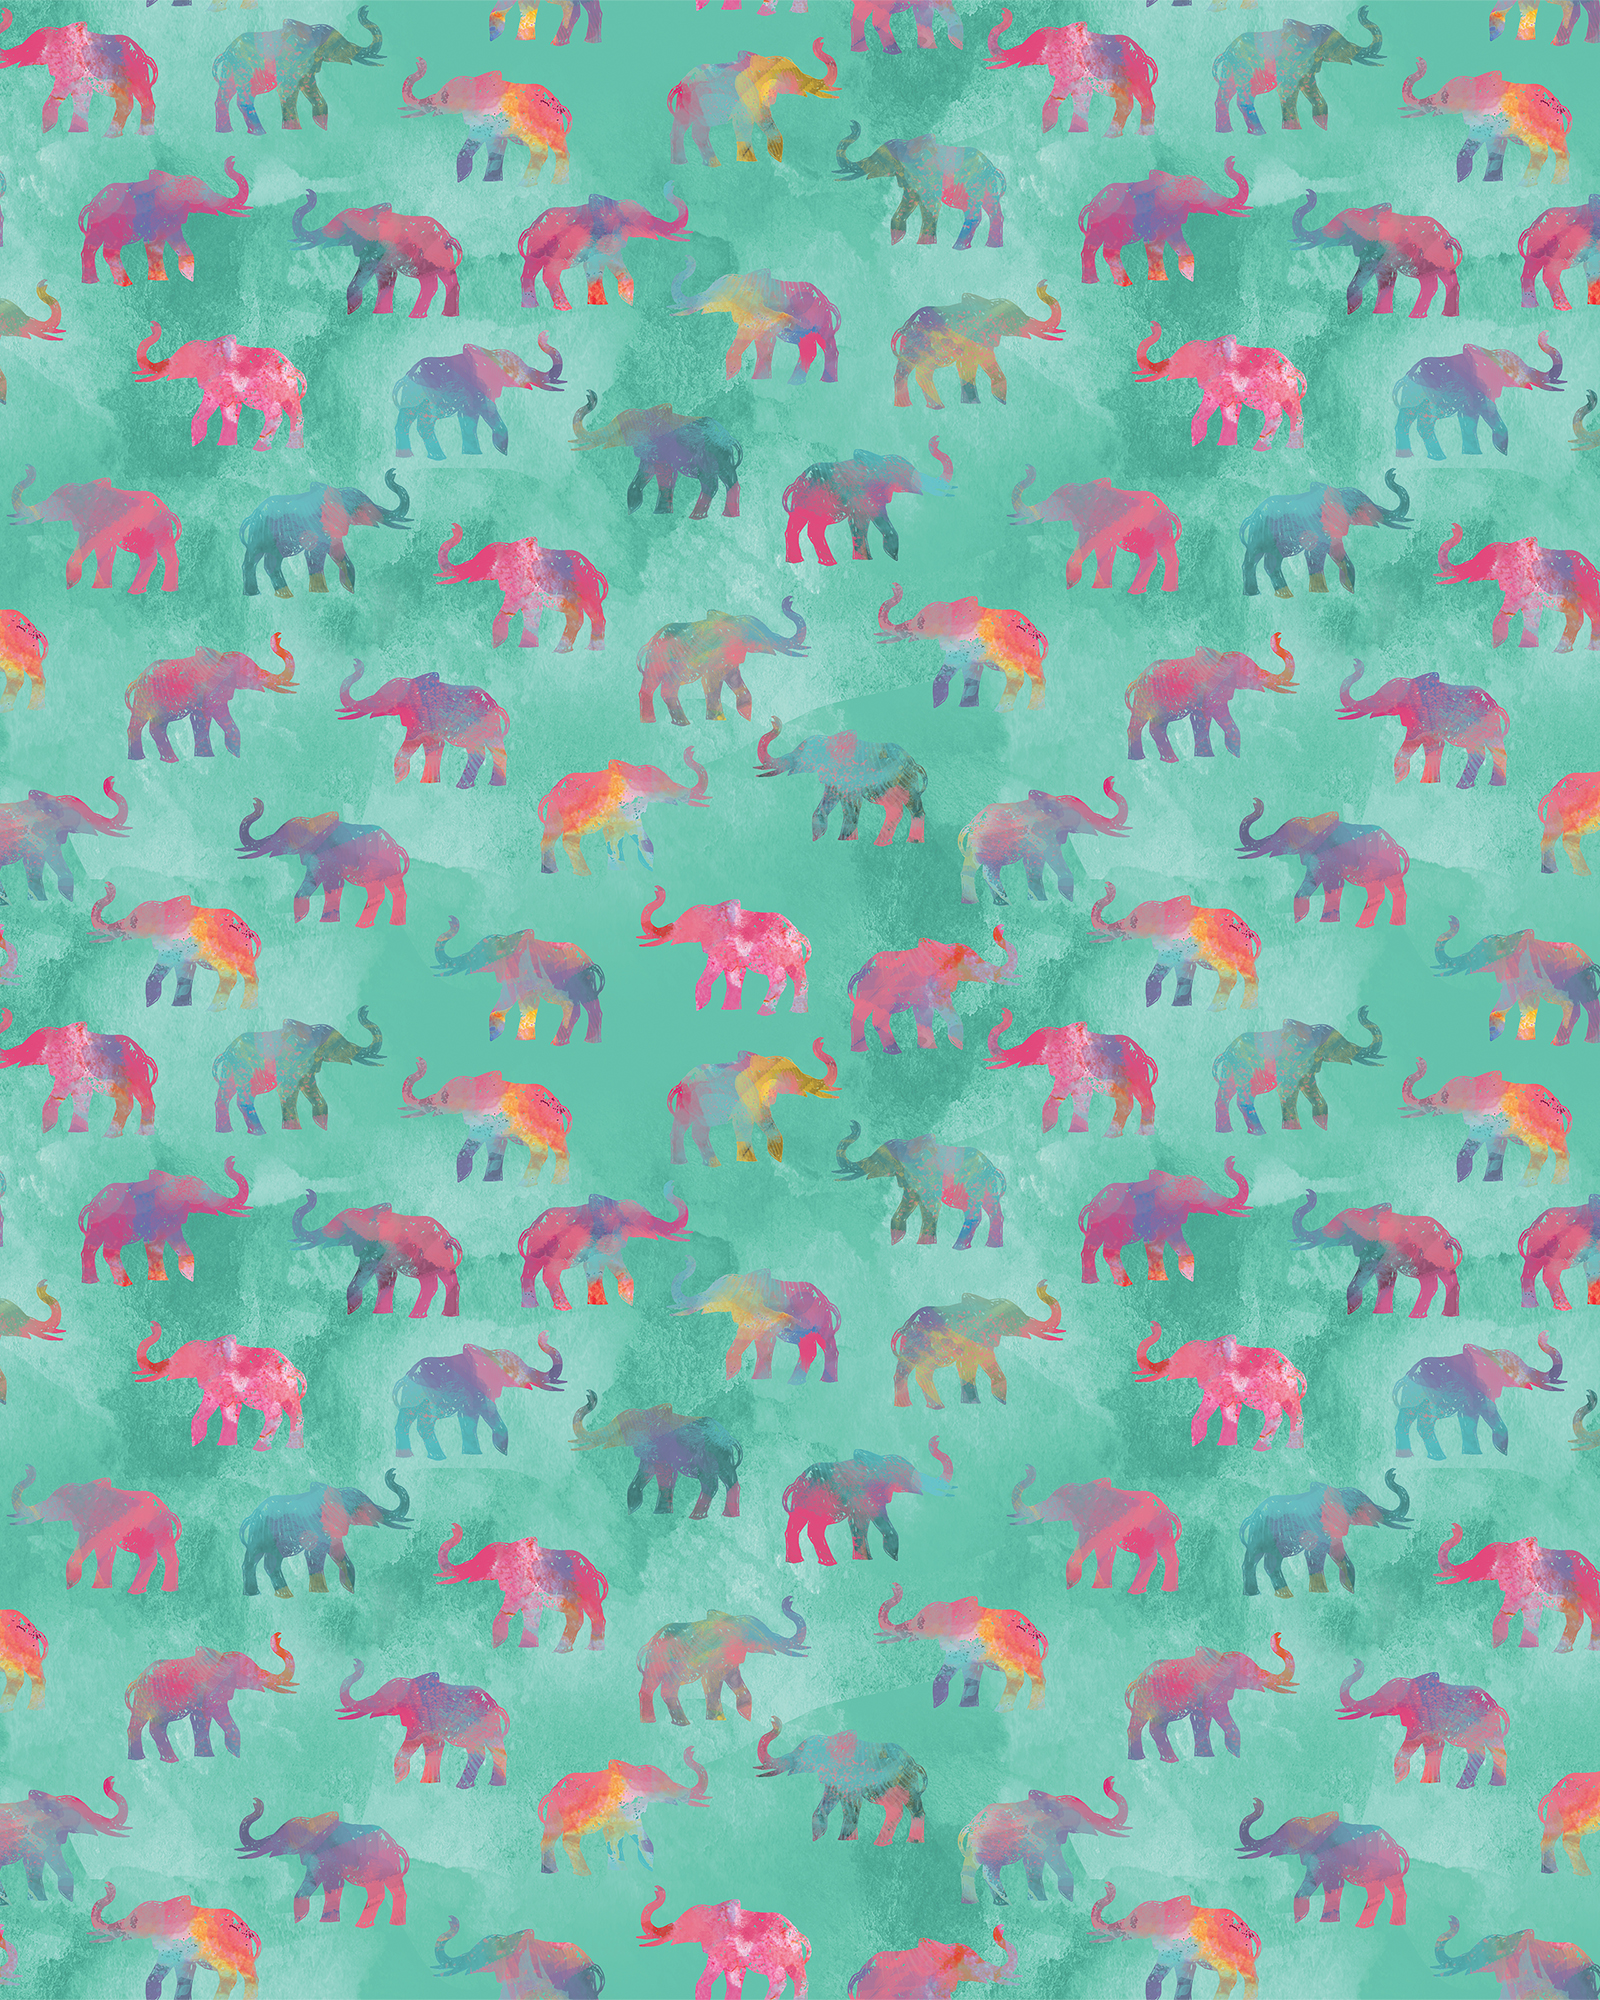 Rainbow Elephants on Parade